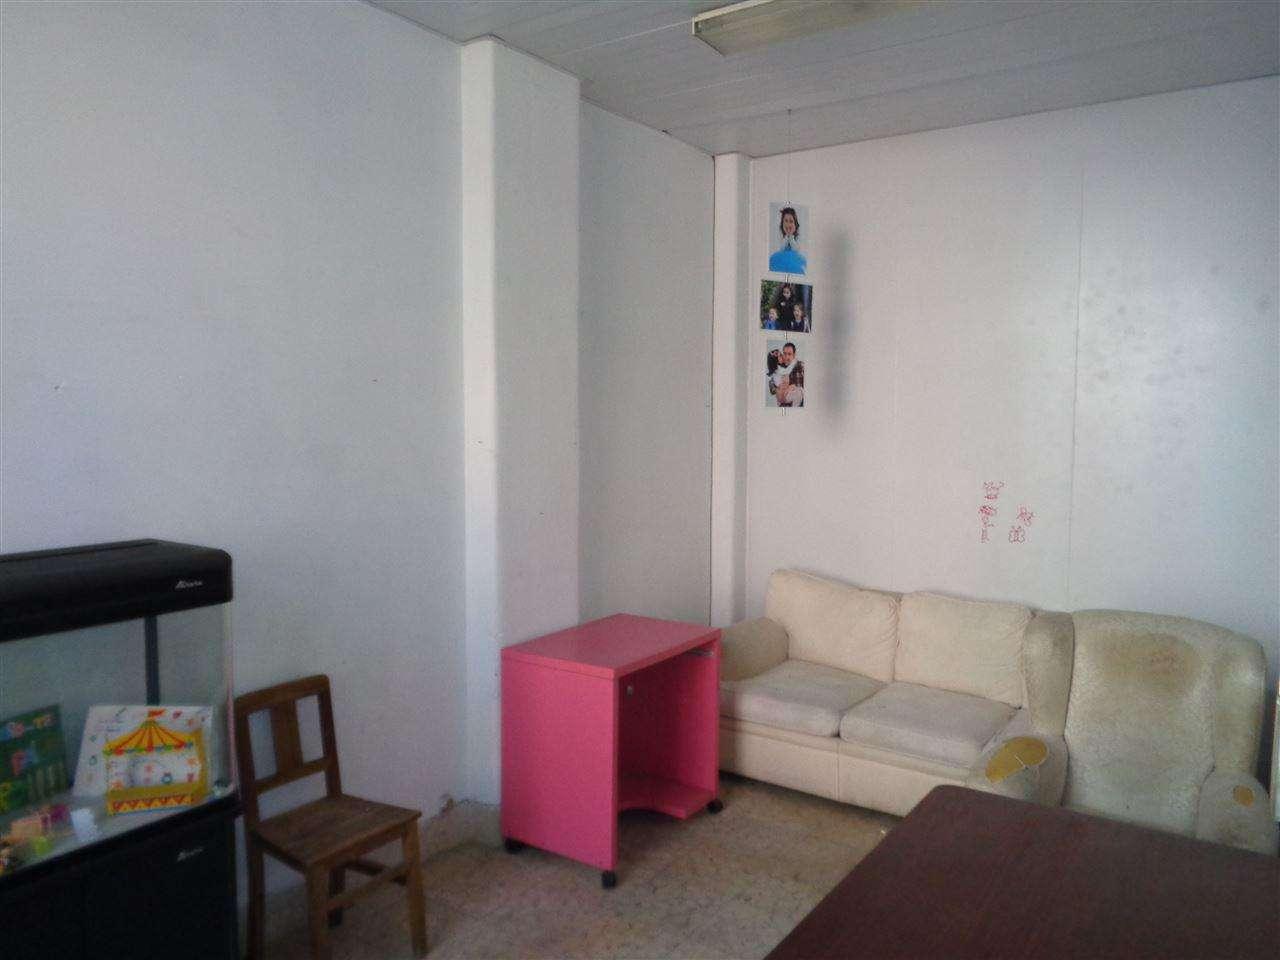 Armazém para arrendar, Penha de França, Lisboa - Foto 5